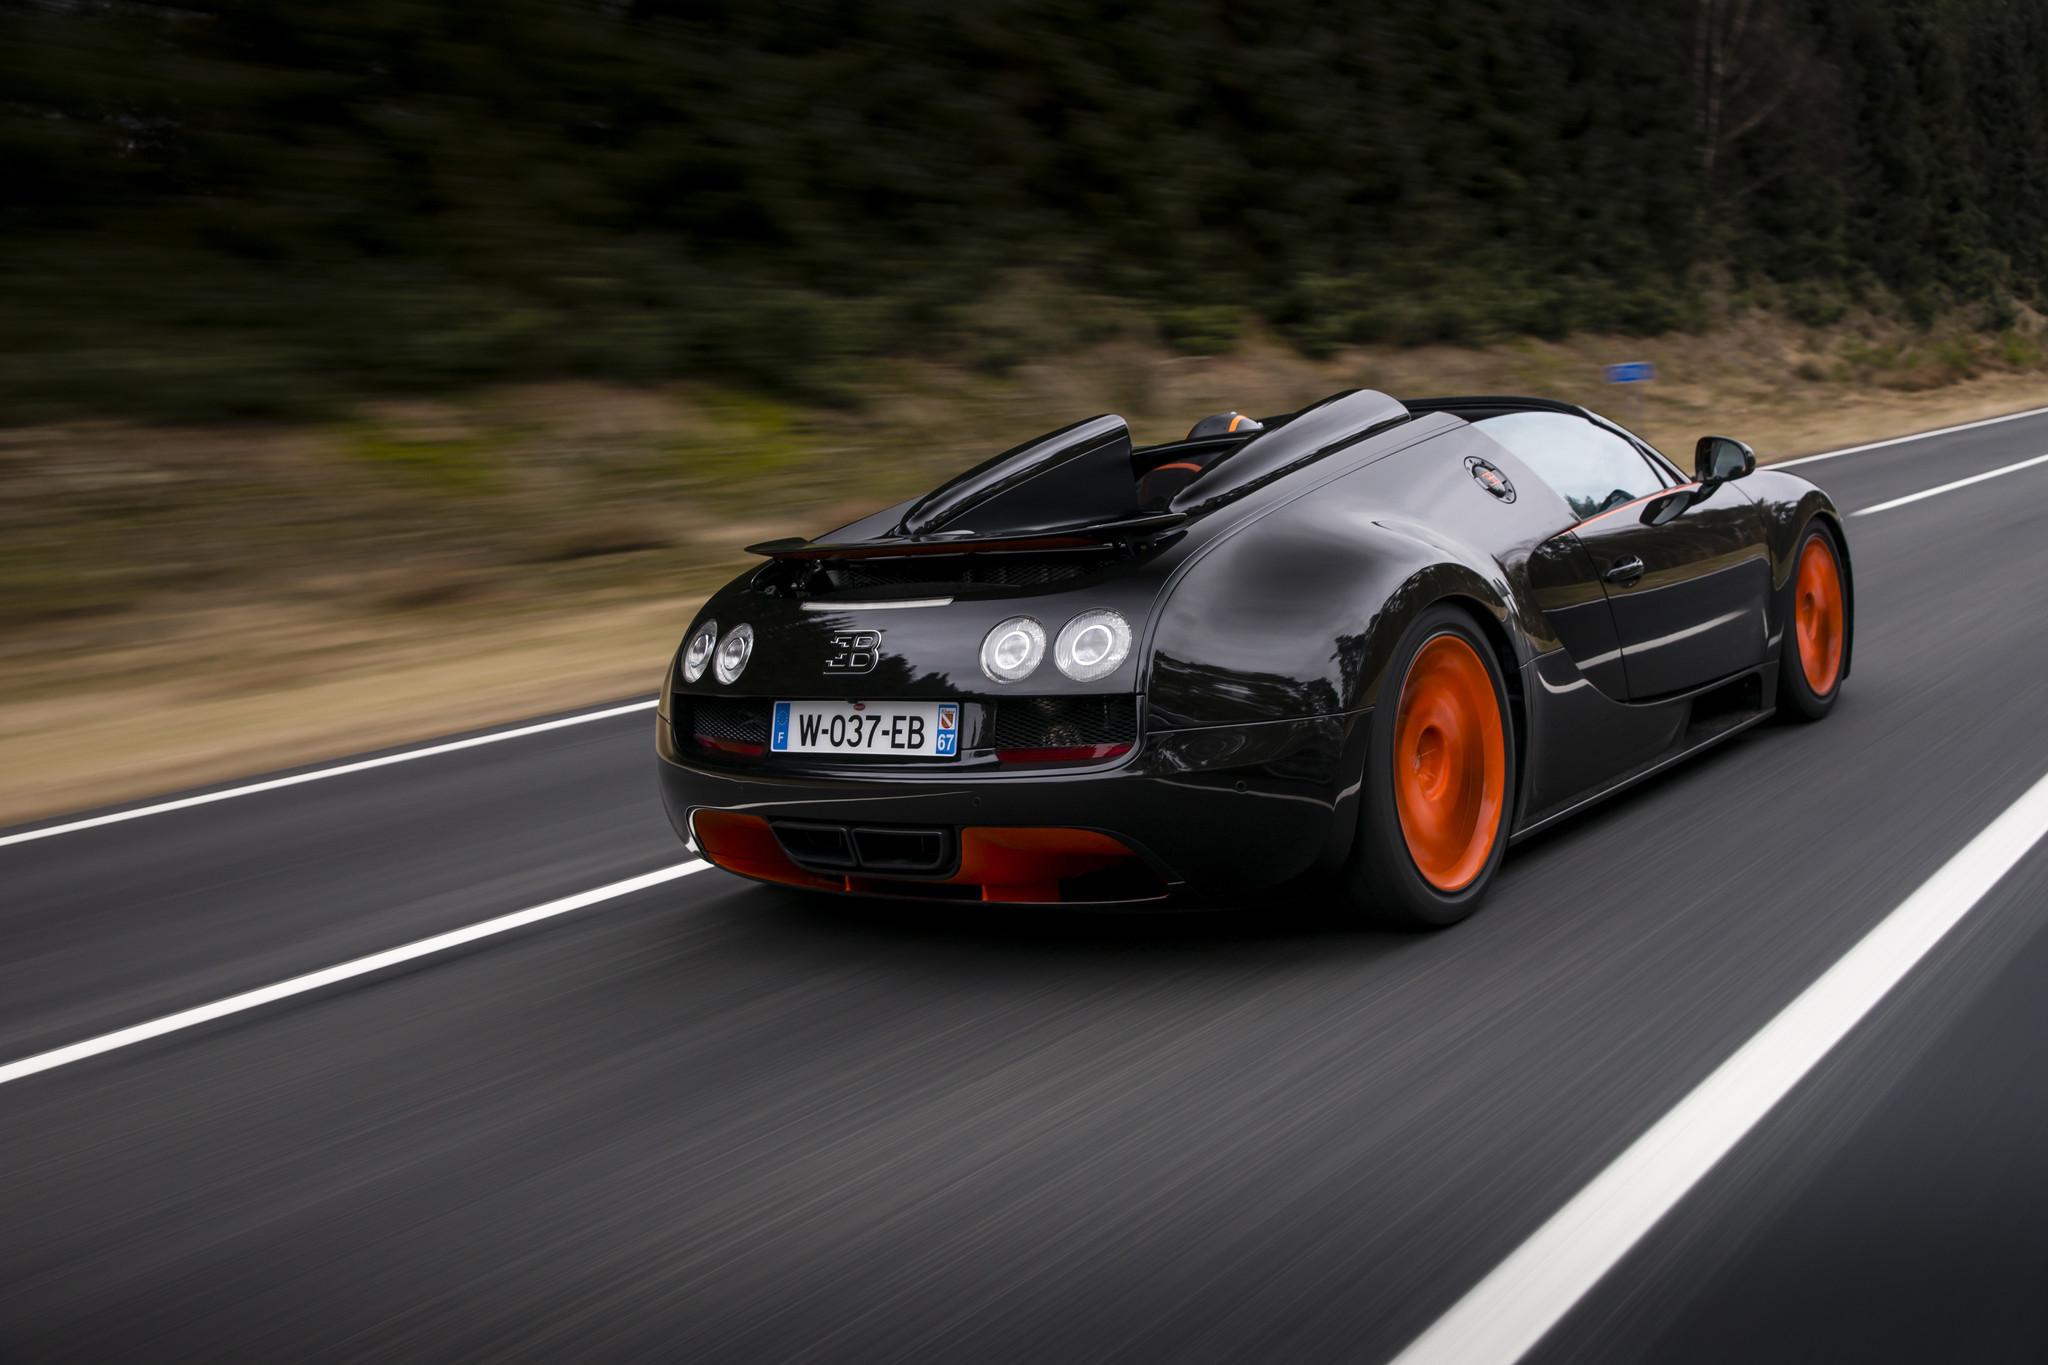 la-fi-hy-autos-bugatti-grand-sport-vitesse-photos Amazing Bugatti Veyron Grand Sport Vitesse Information Cars Trend